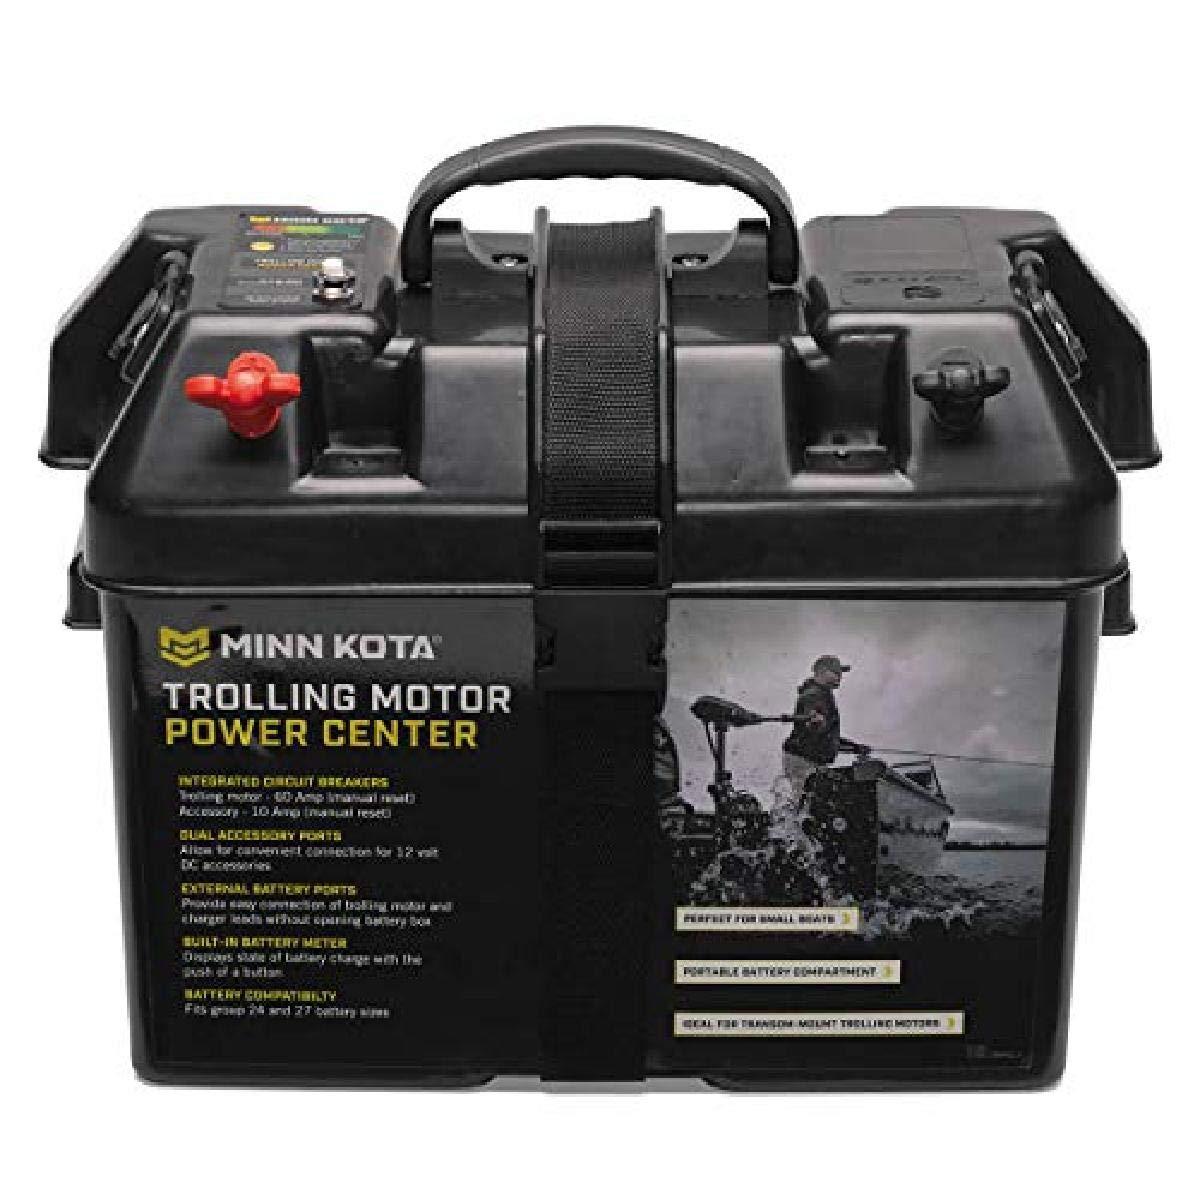 Minn Kota 1820175 Trolling Motor Battery Power Center Marine Battery Accessory